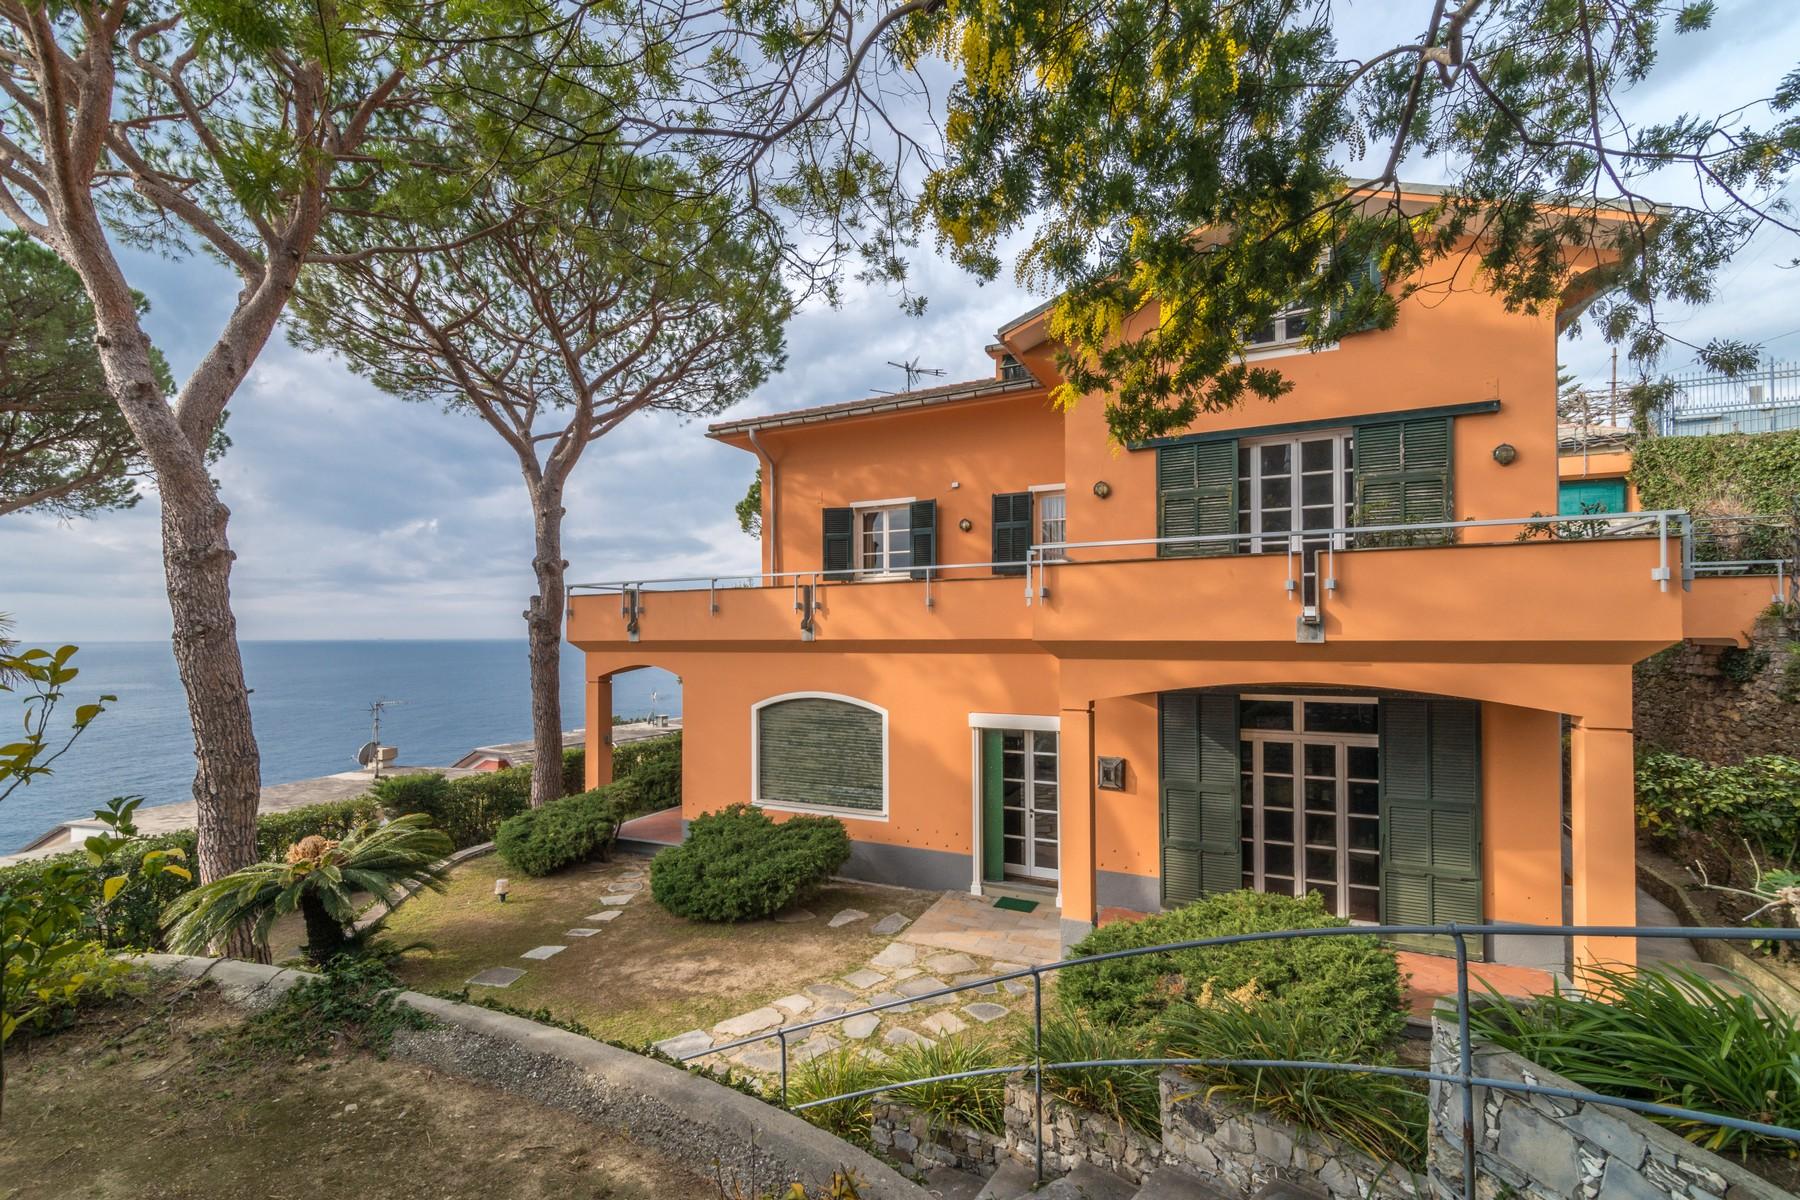 Villa in Vendita a Sori: 5 locali, 720 mq - Foto 1